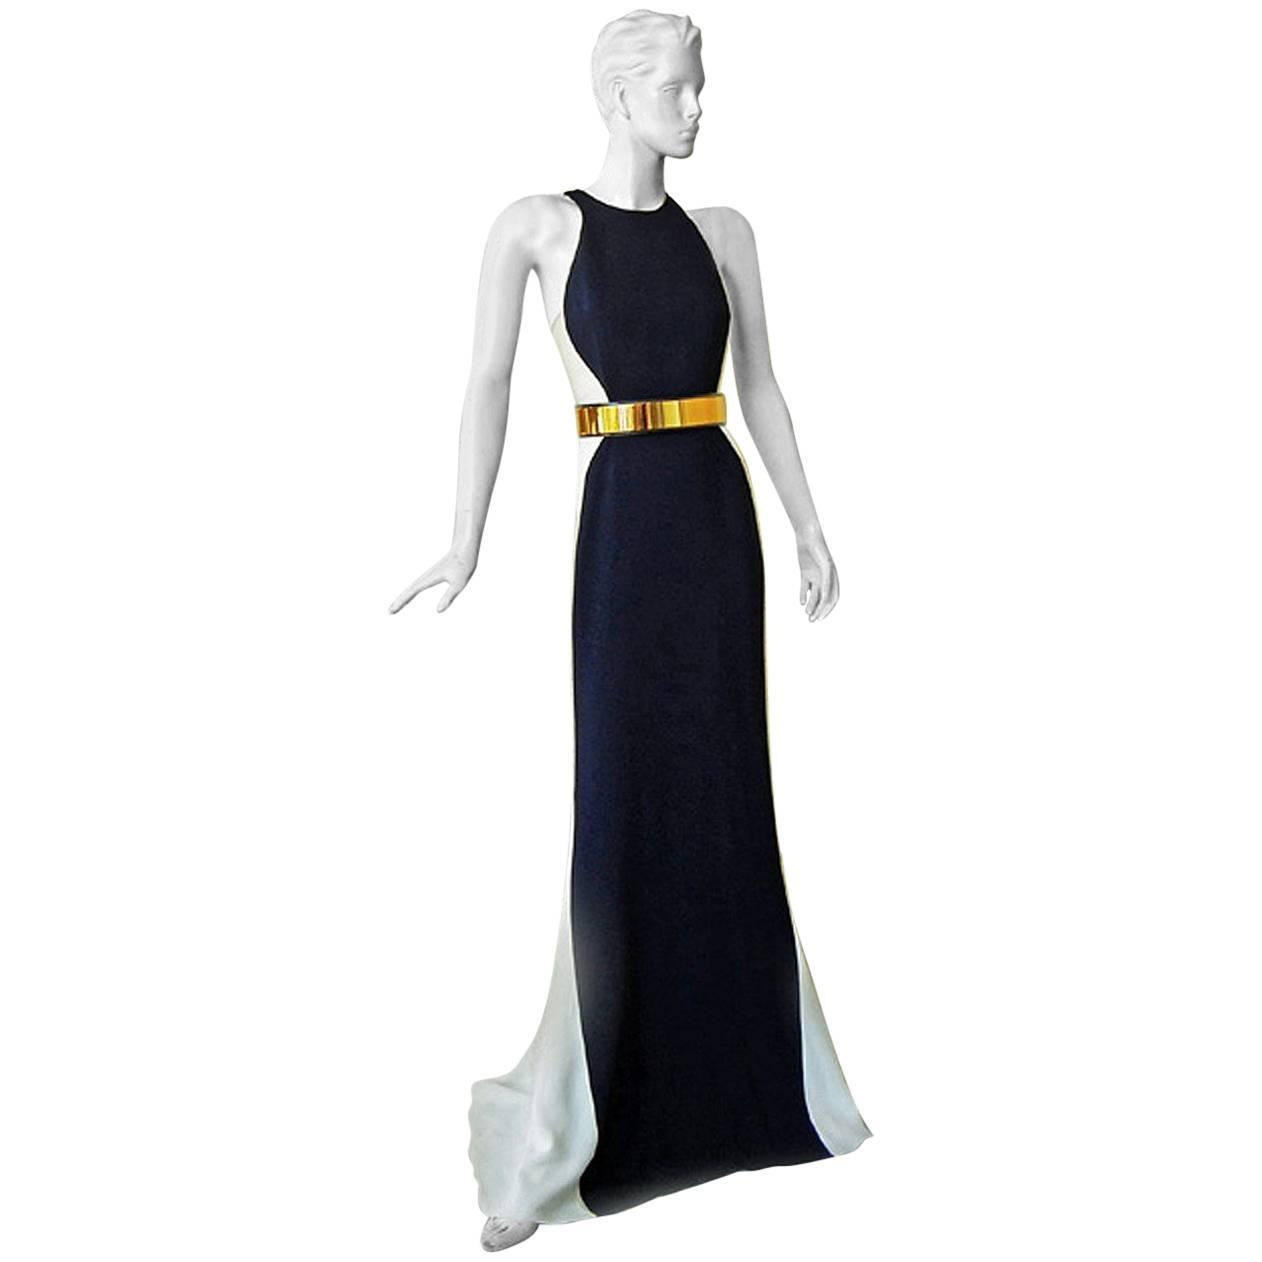 NWT Stunning Stella McCartney Saskia Dress Gown Seen on Emmys